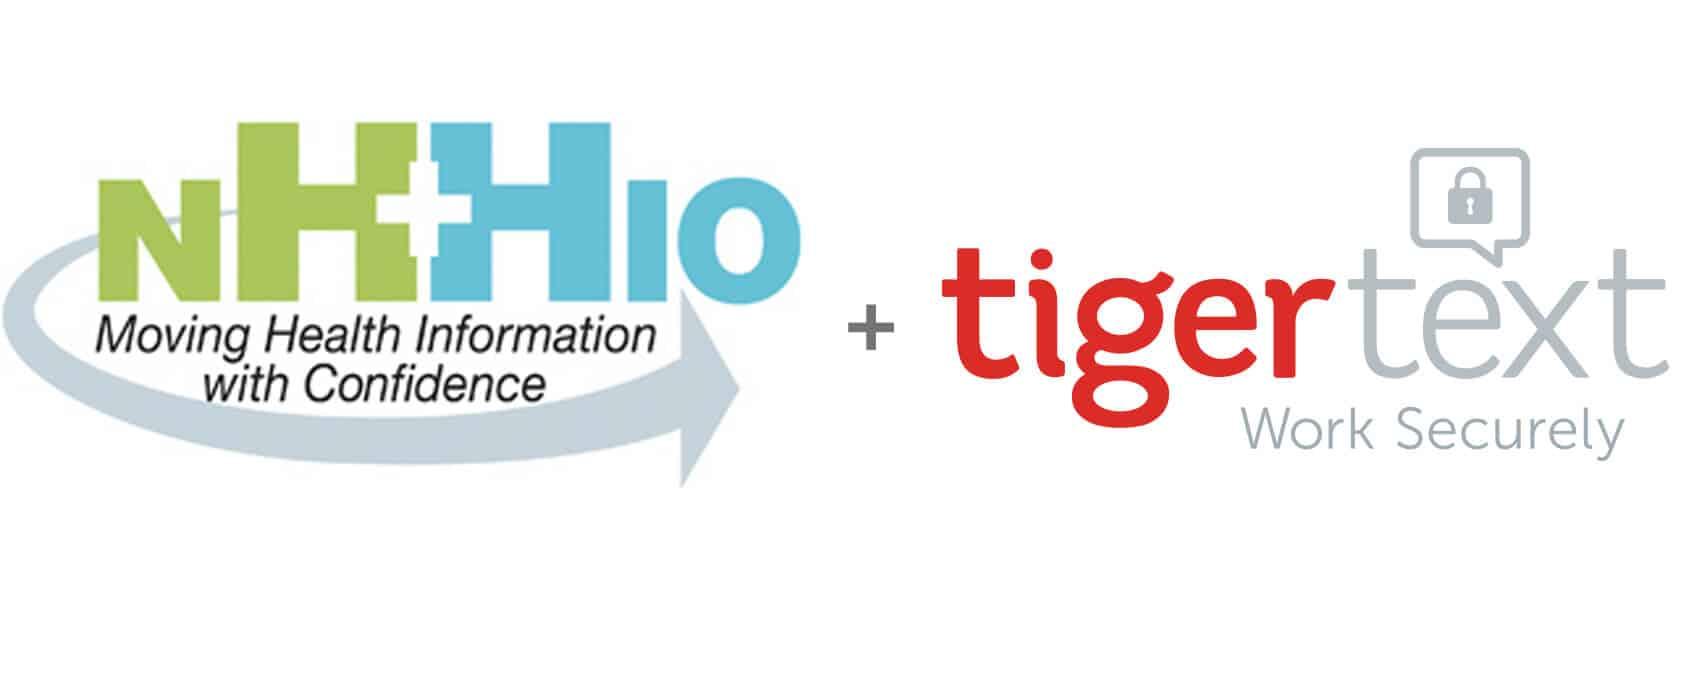 New Hampshire Health Information Organization Upgrades Communication System, Selects TigerText Secure Messaging Platform